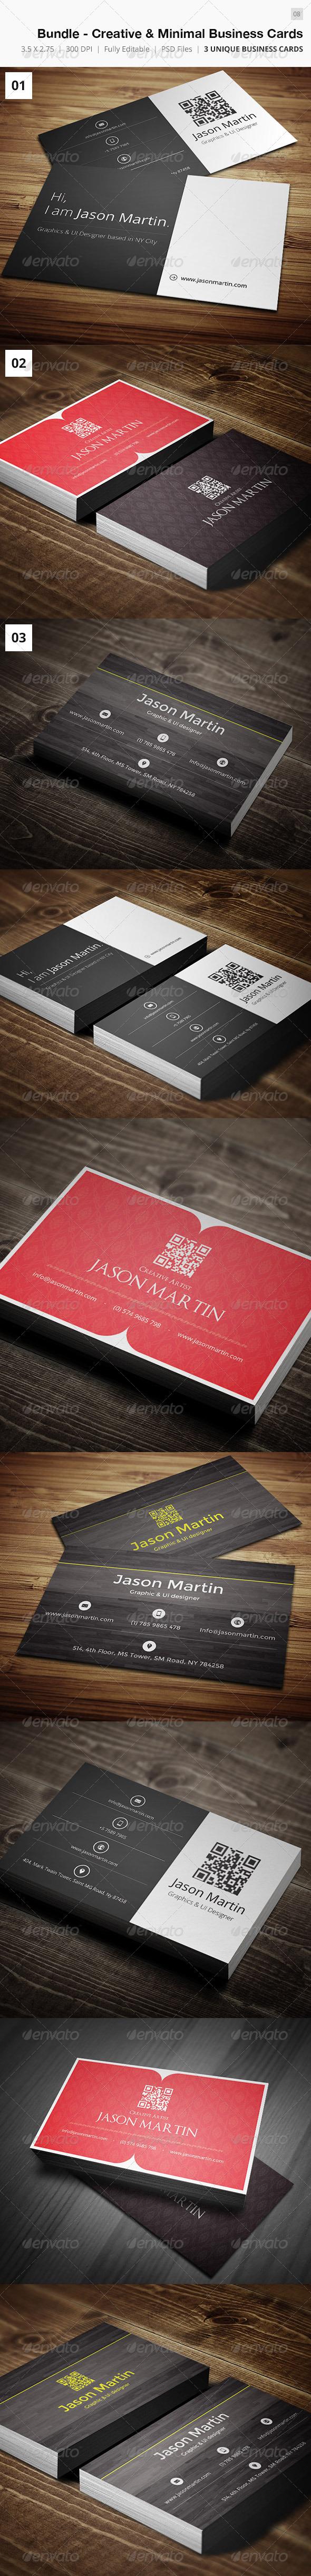 GraphicRiver Bundle Minimal & Creative Business Cards 08 4988522